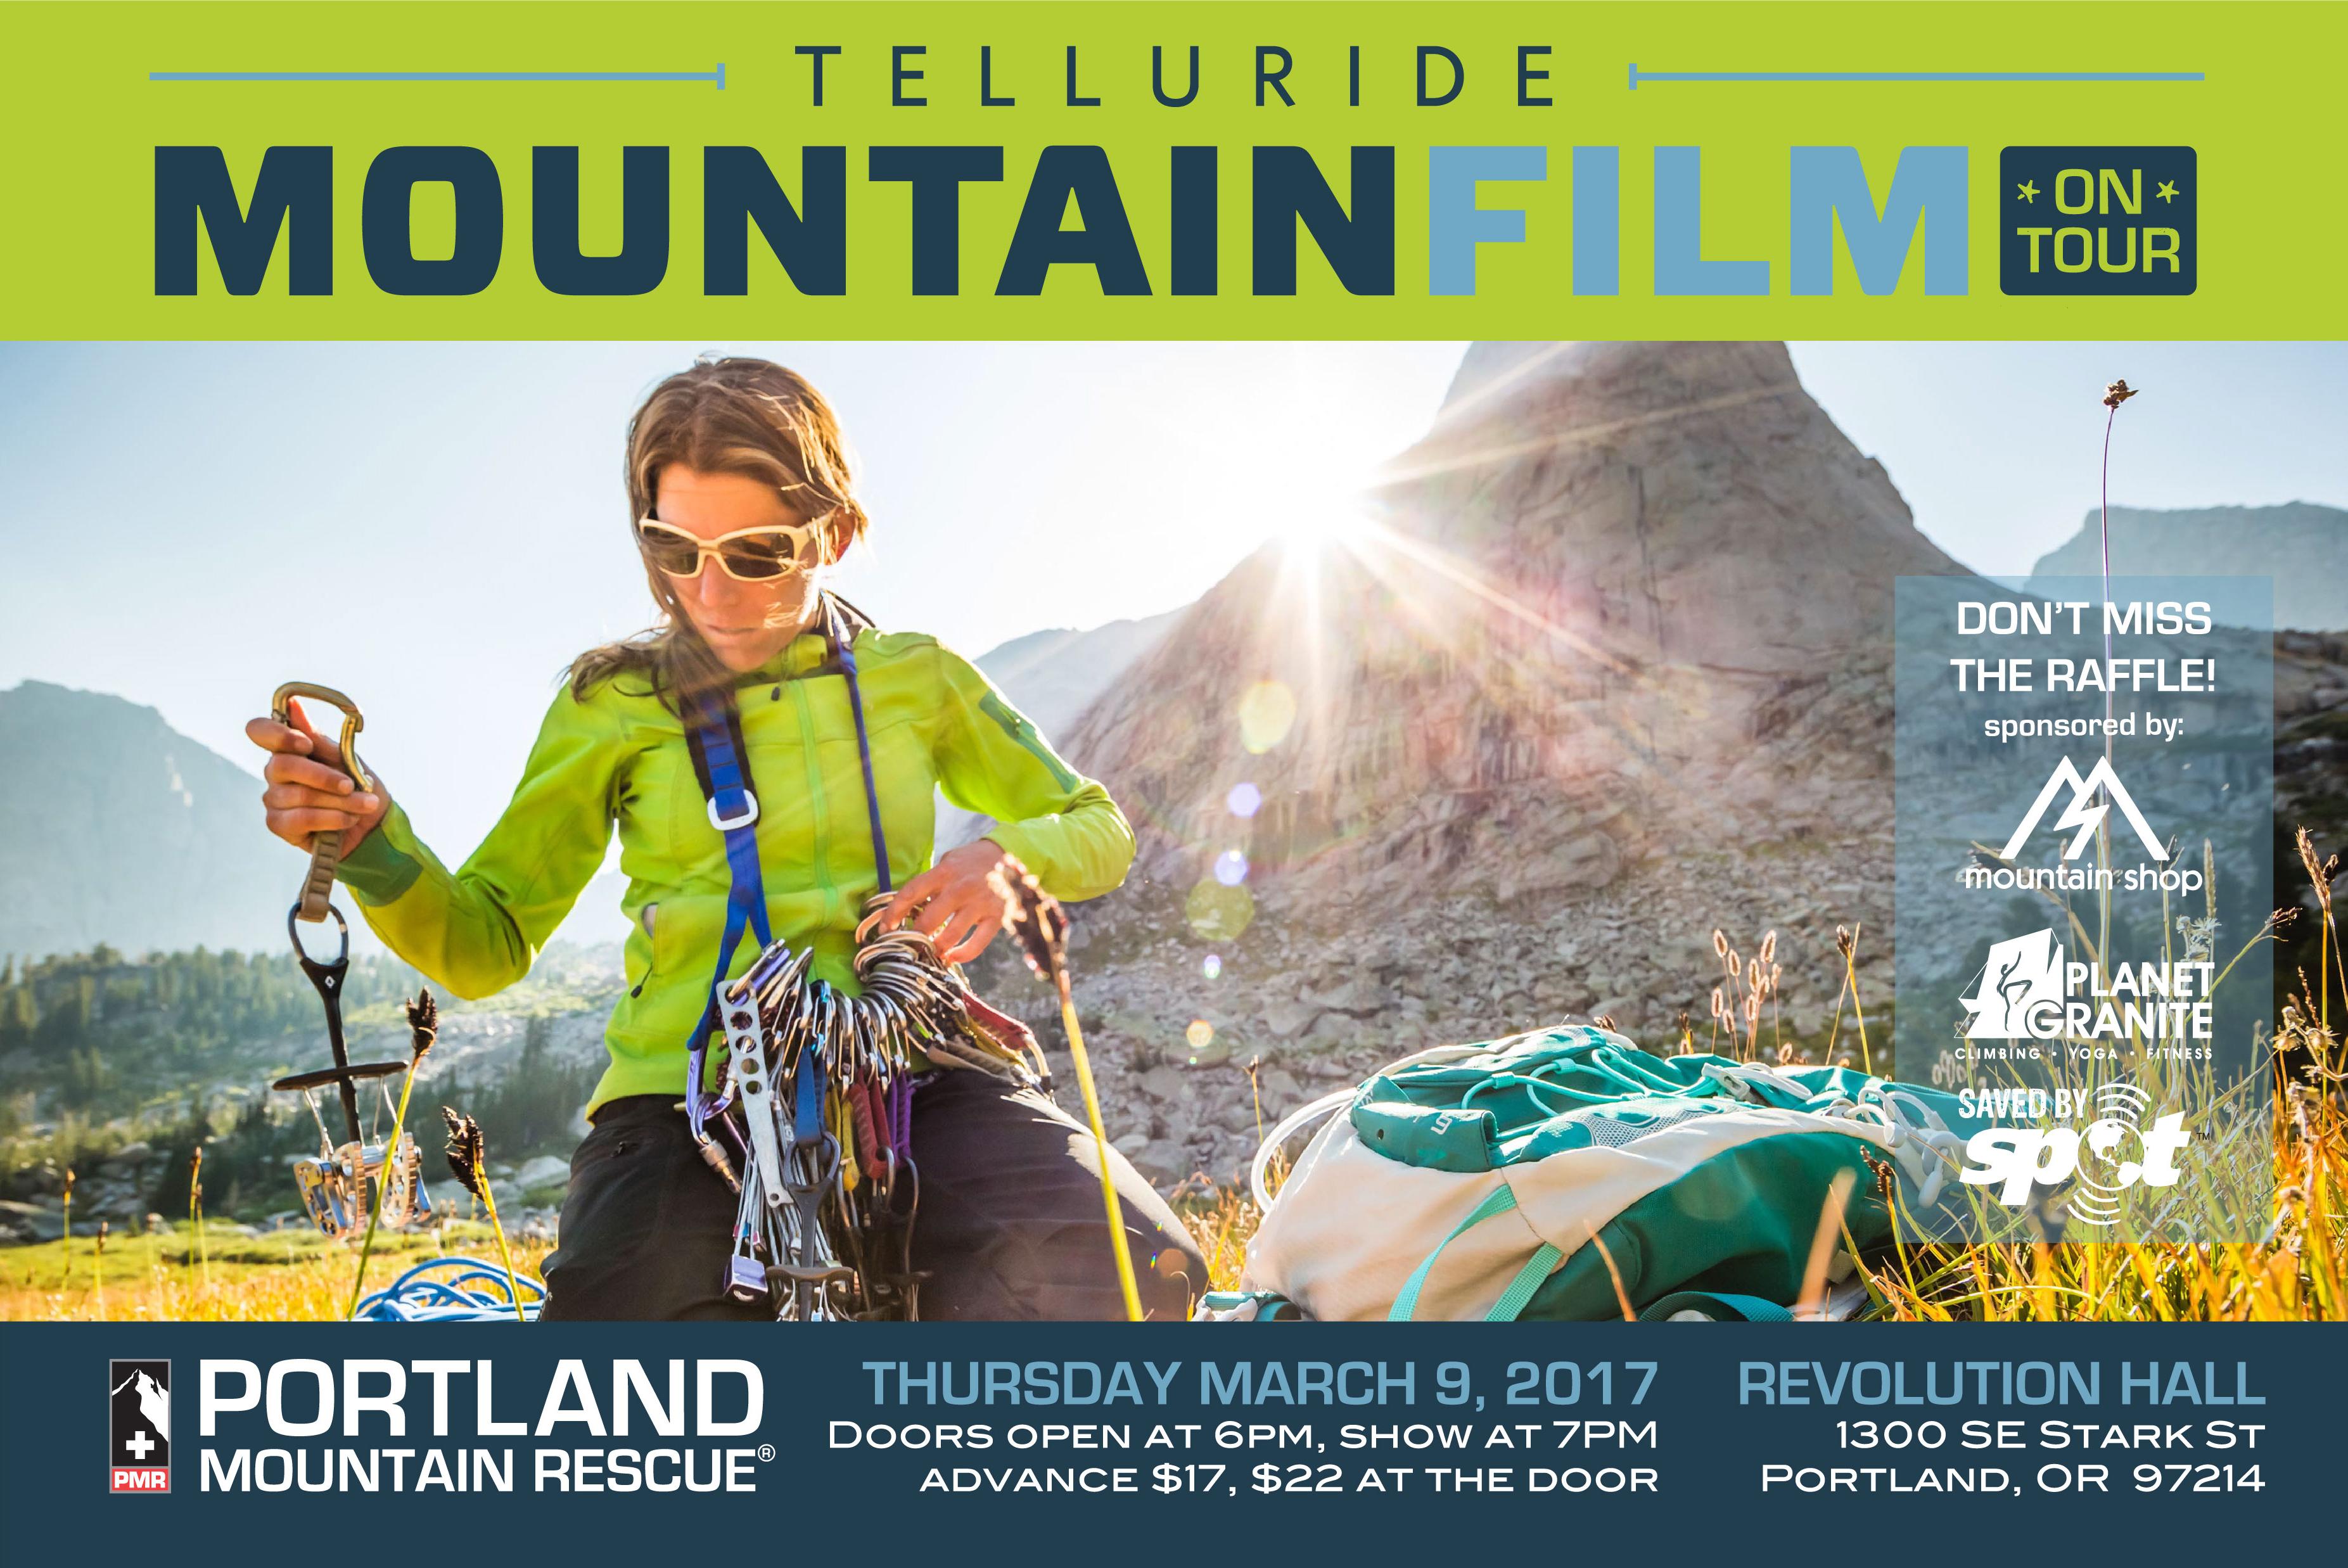 Portland Mountain Rescue